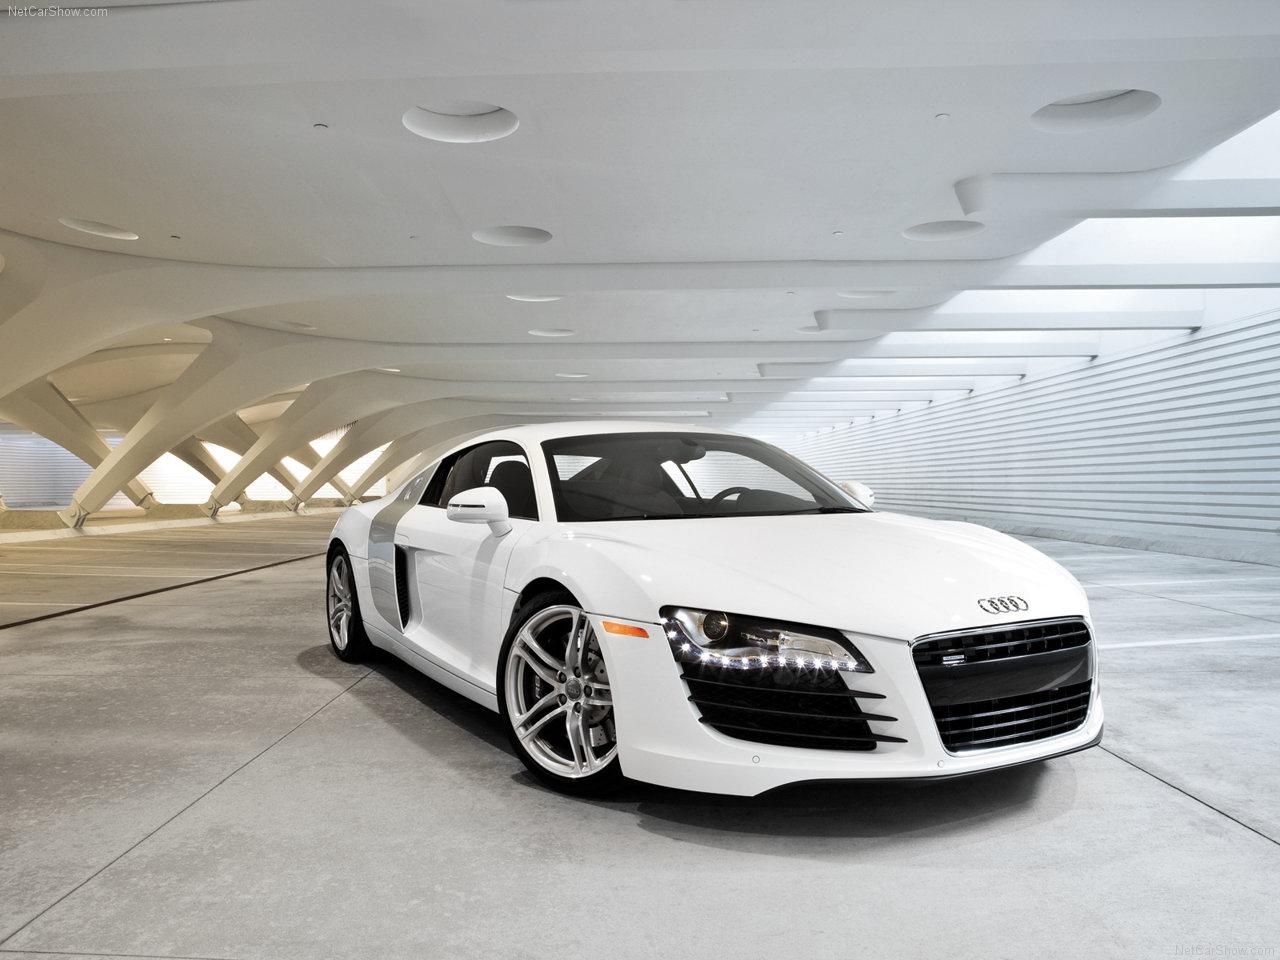 0_1521011827408_Audi-R8-2008-1280-01.jpg